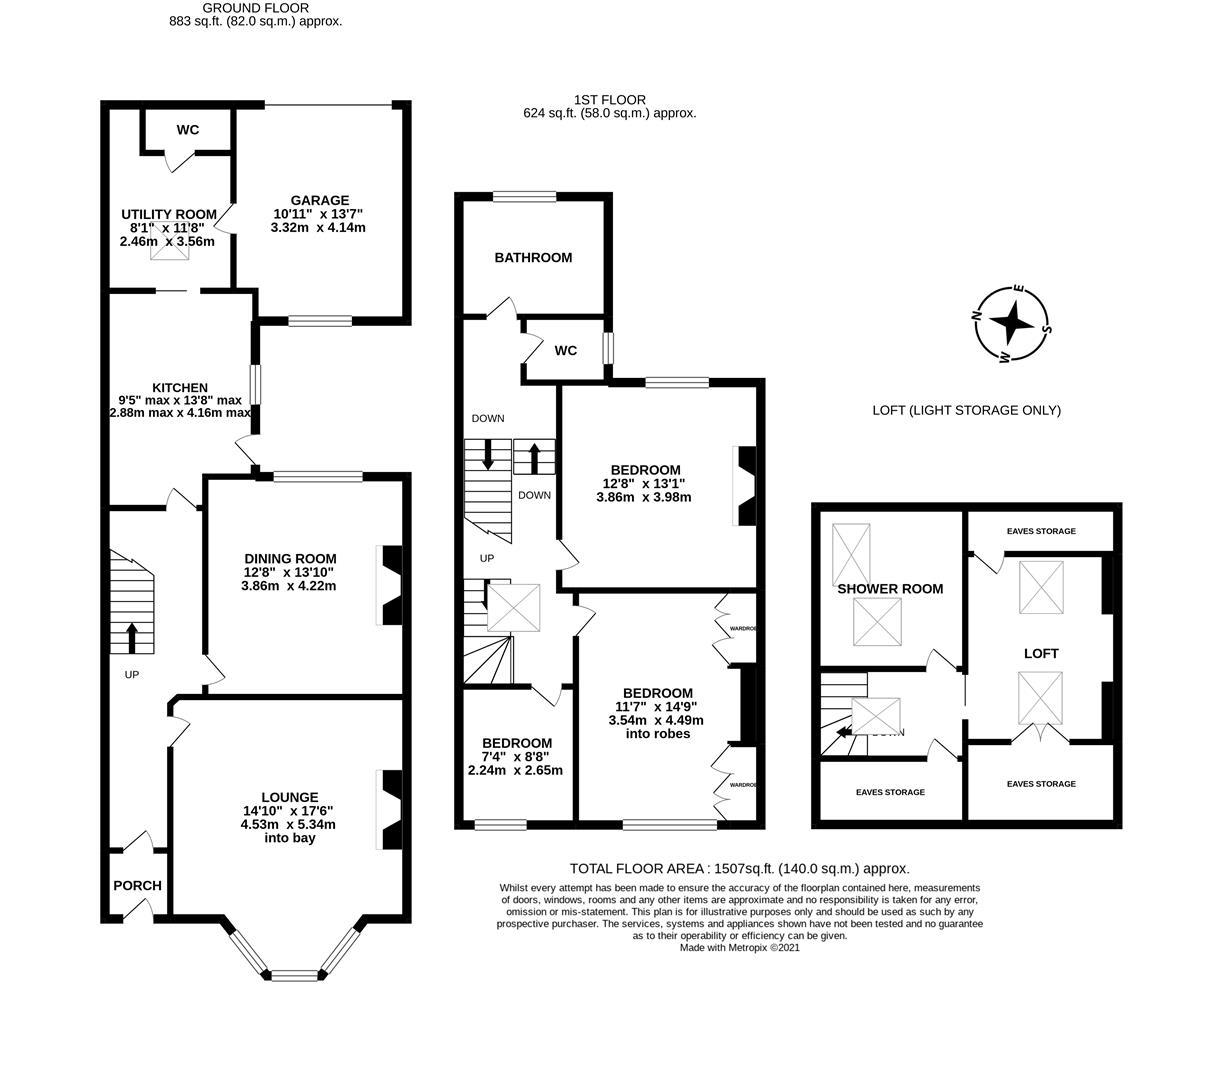 floorplan for <%= CurrentProperty.Header %>